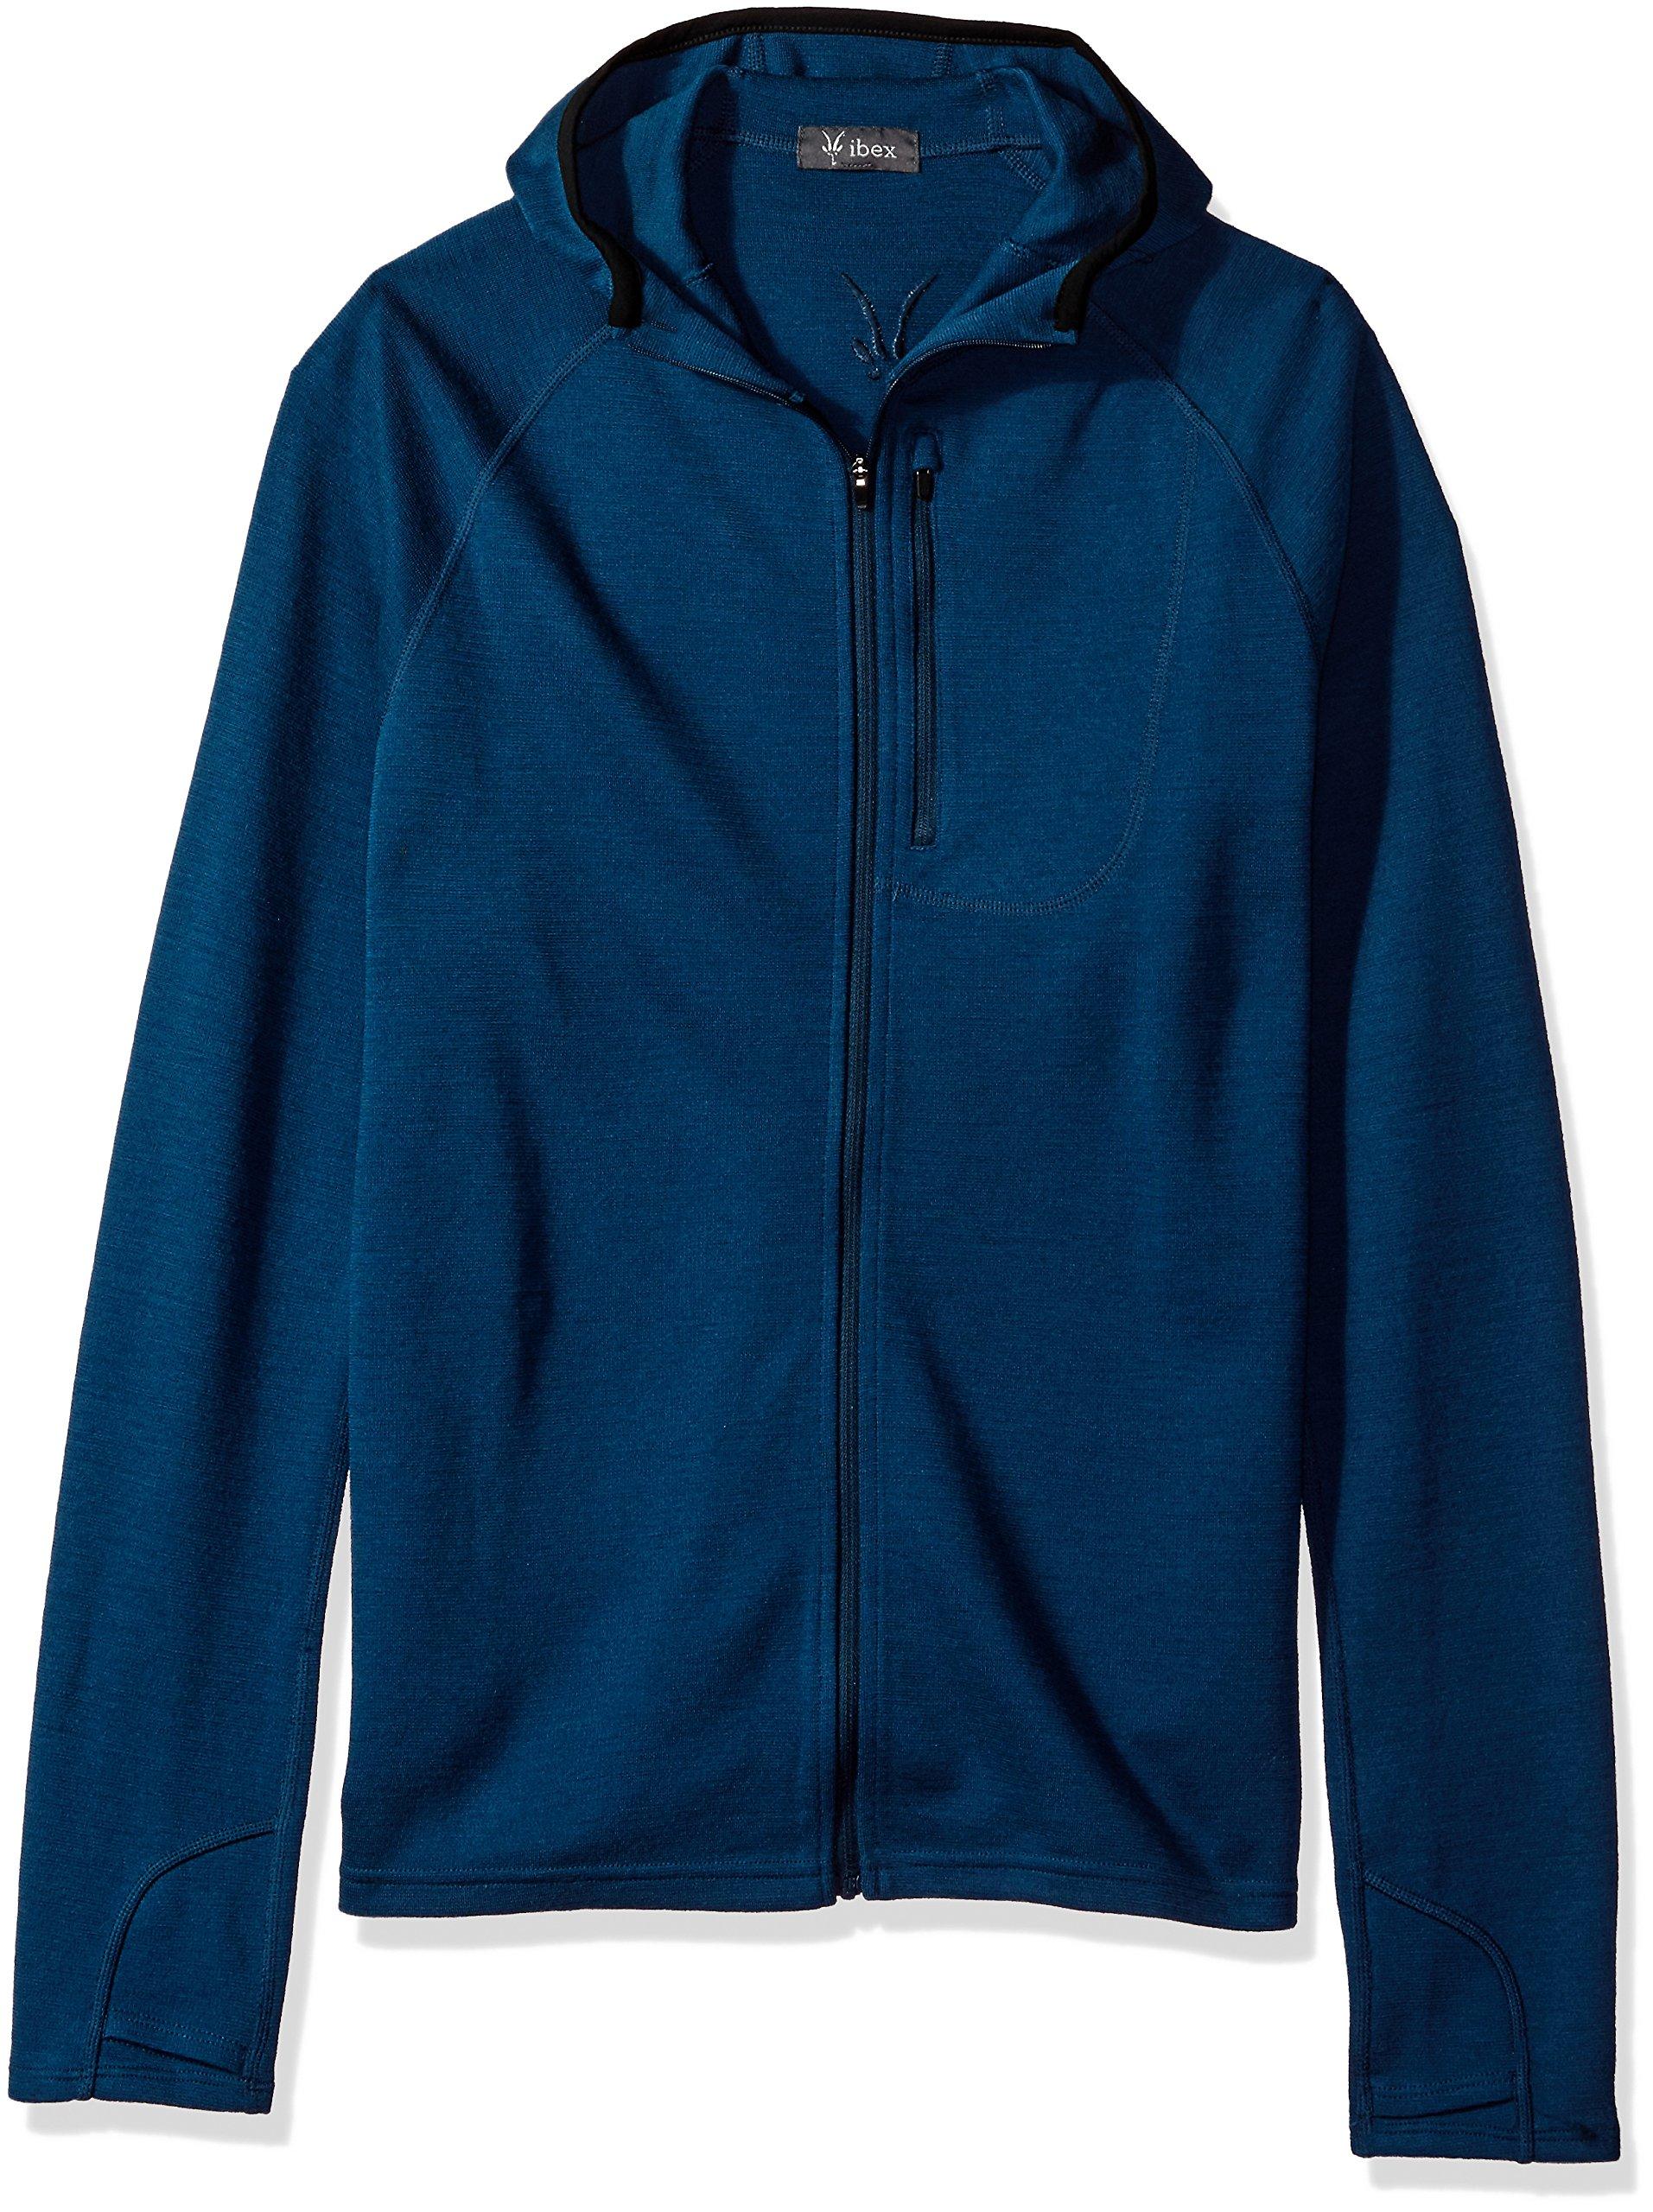 Ibex outdoor Clothing Merino Wool Shak Hoodoo Hoody, Tundra, Medium